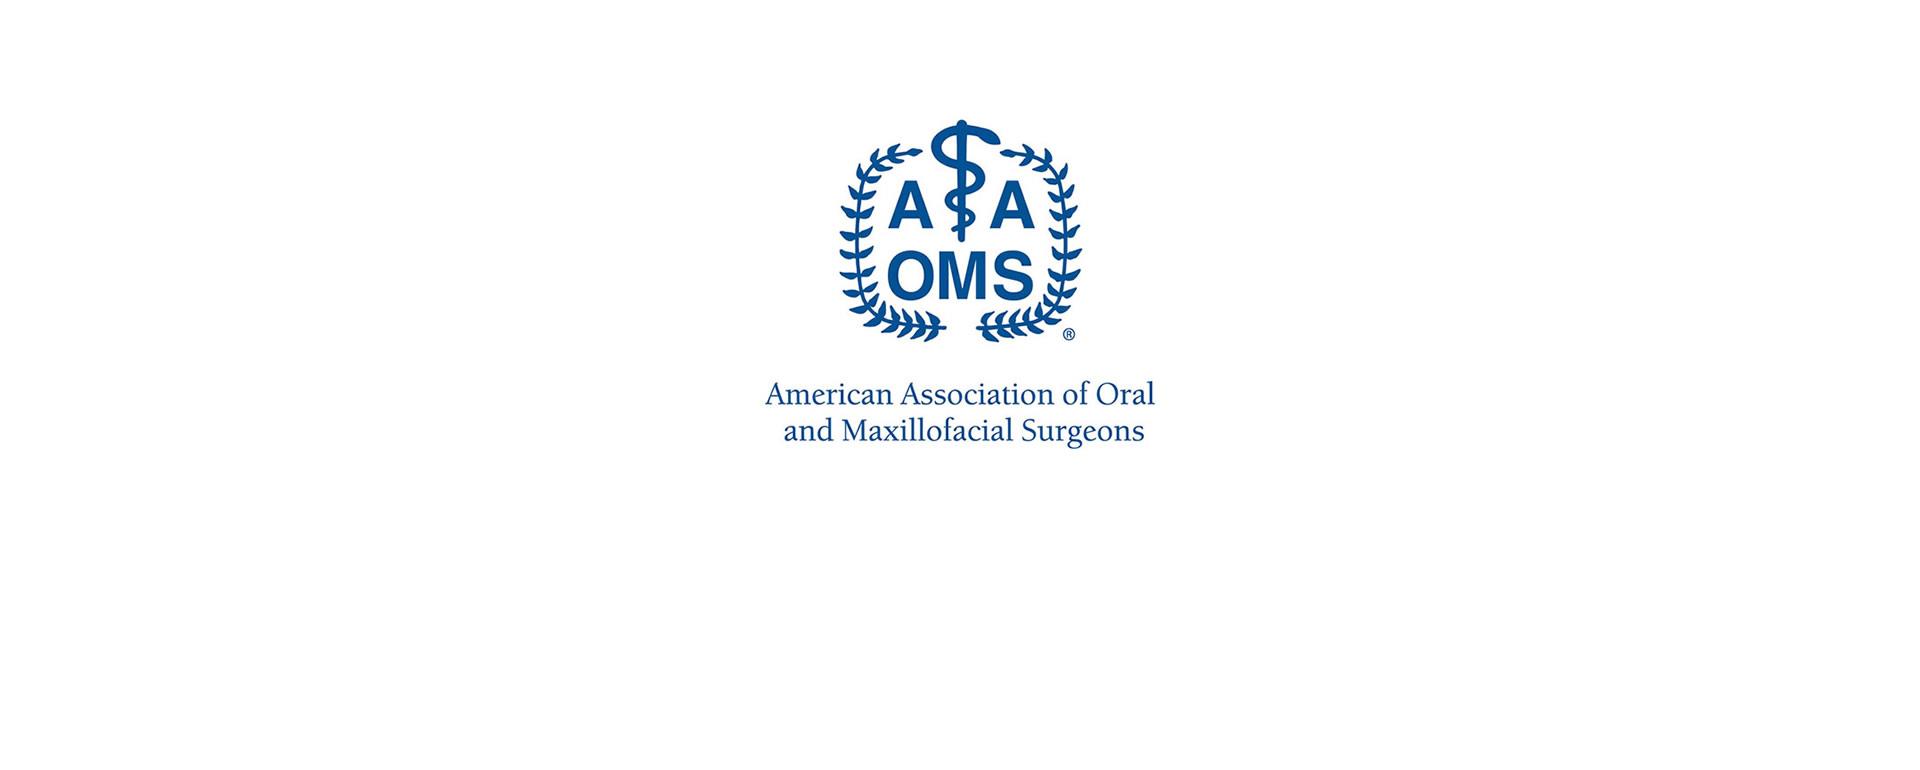 American Association of Oral and Maxillofacial Surgeons - logo